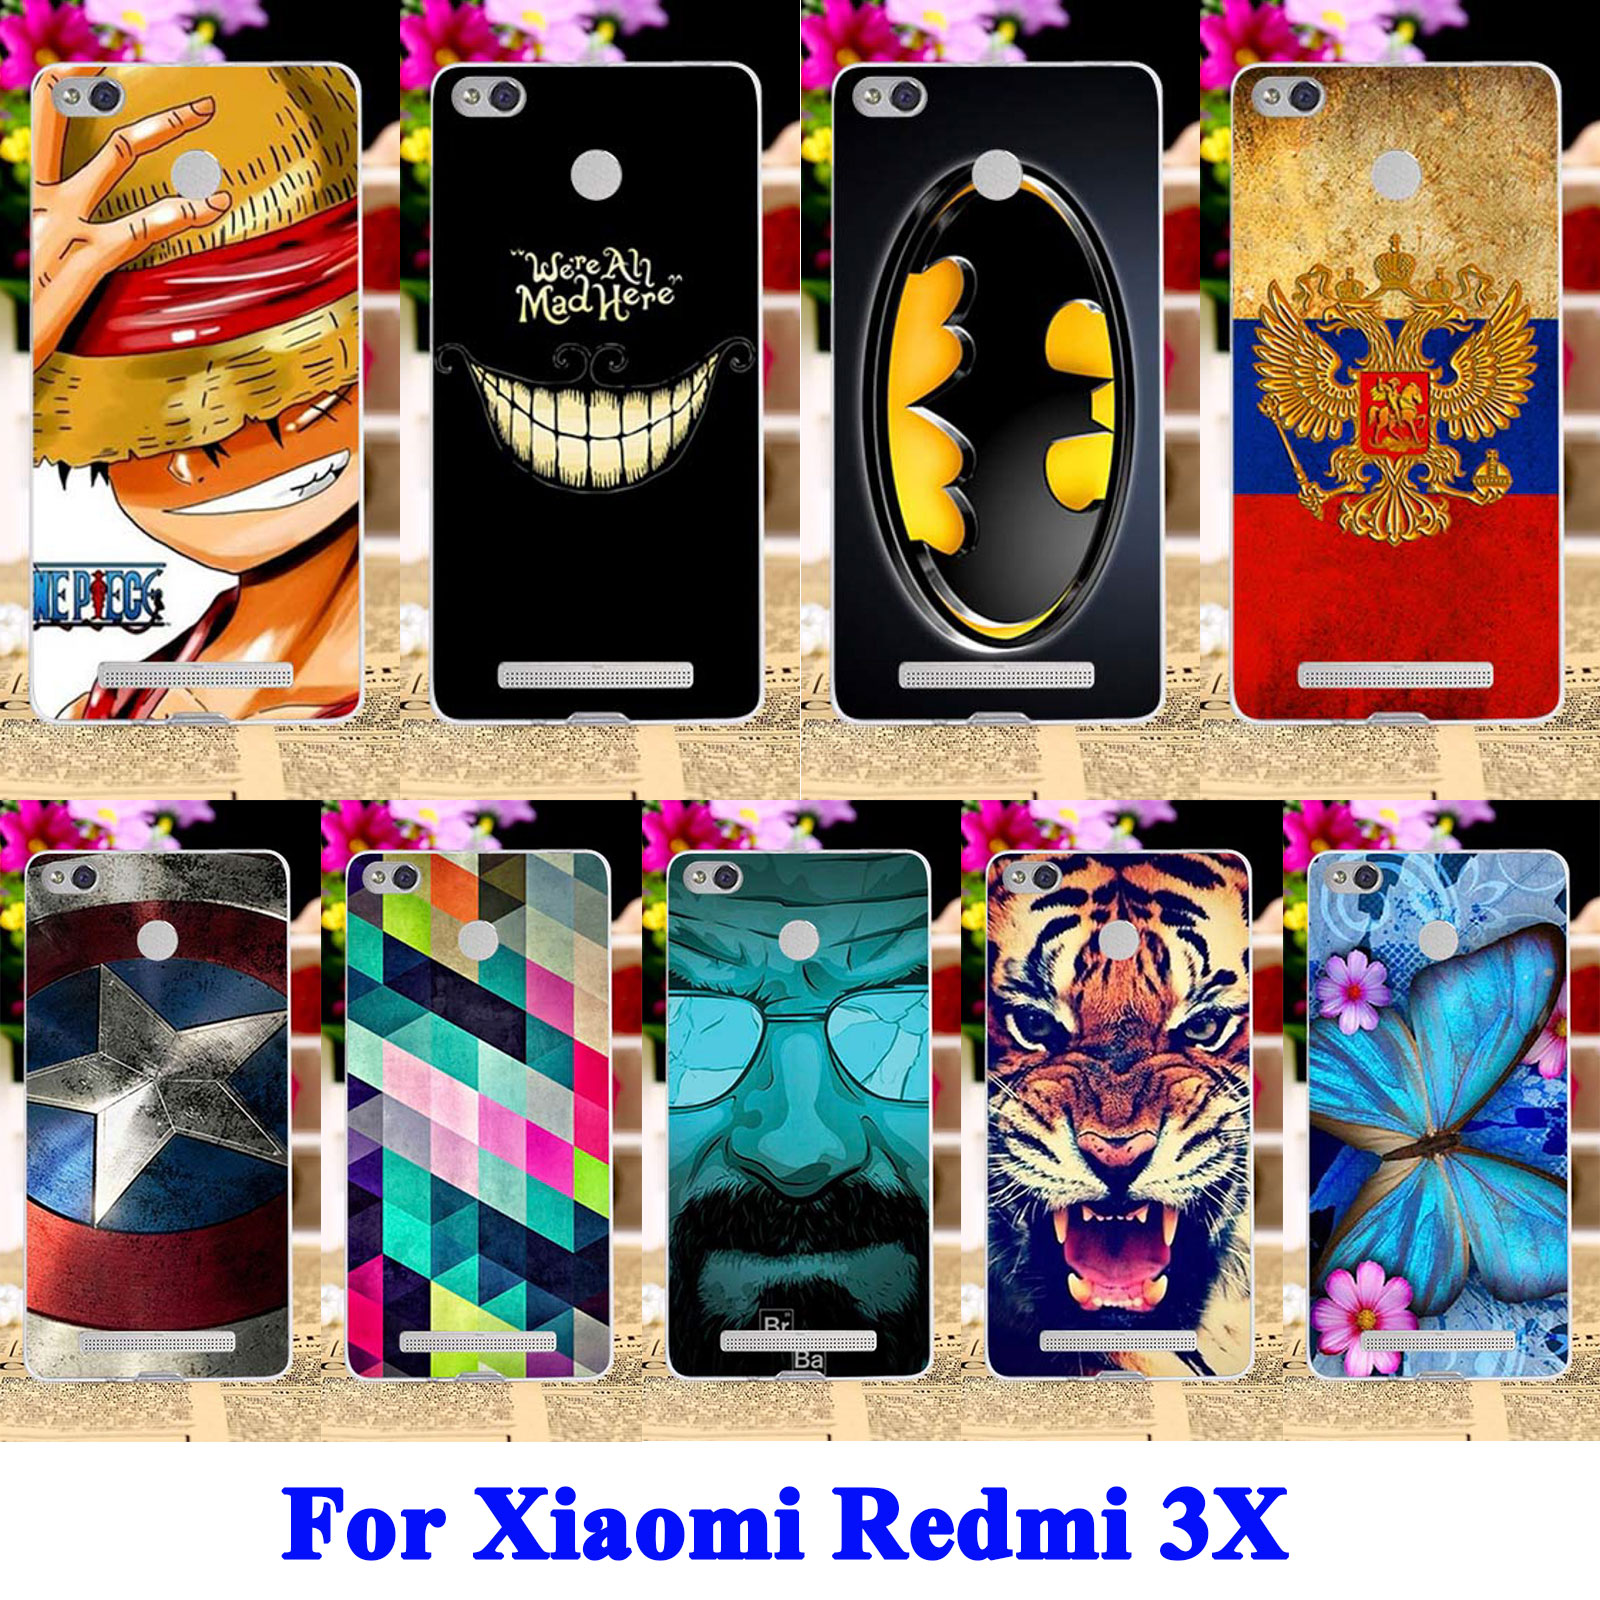 Suave tpu cajas del teléfono celular de plástico duro para xiaomi redmi 3x redmi